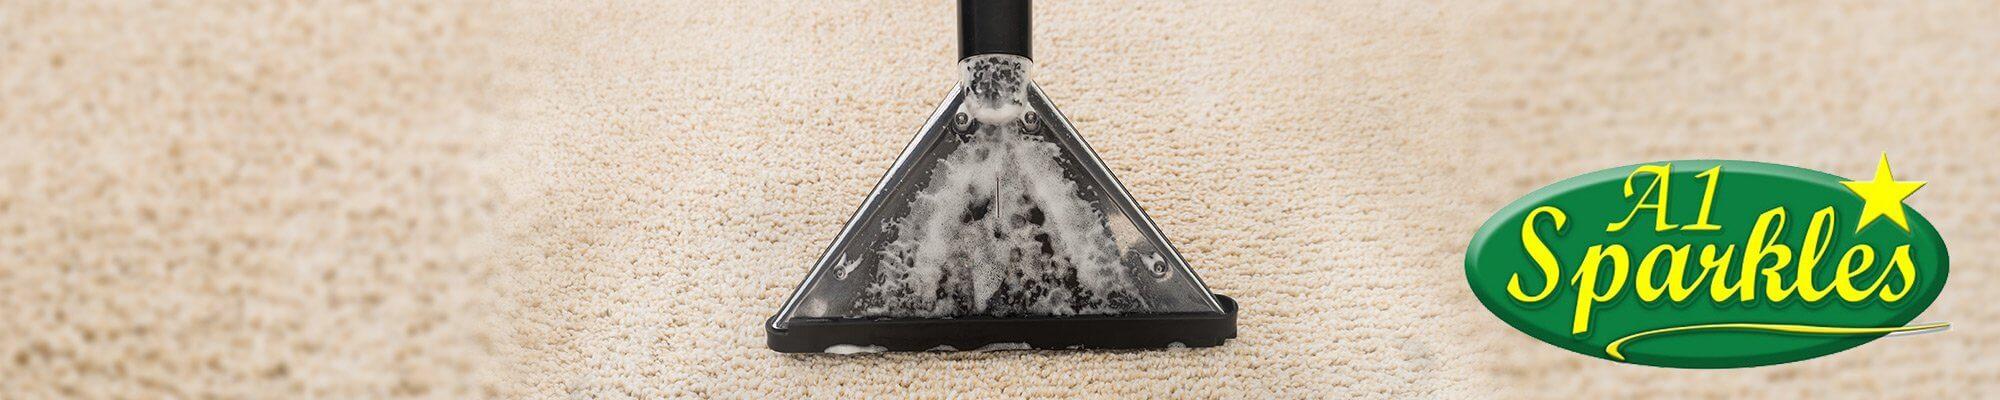 carpet cleaning philadelphia suburbs